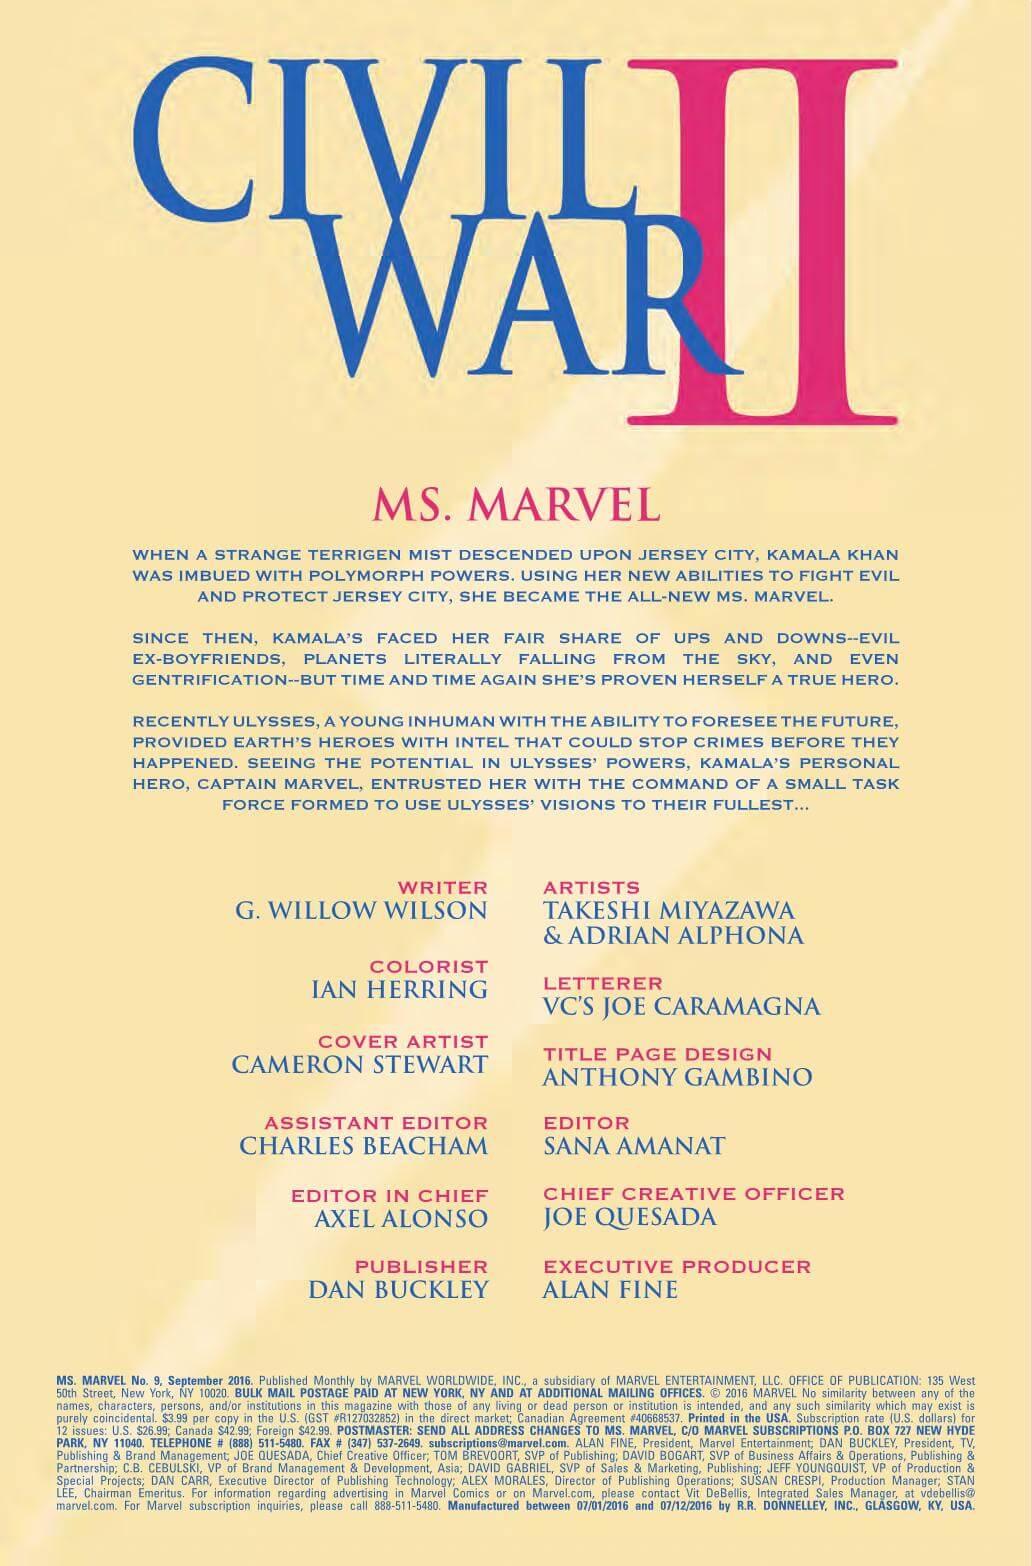 MSMARV2015009_int2_1